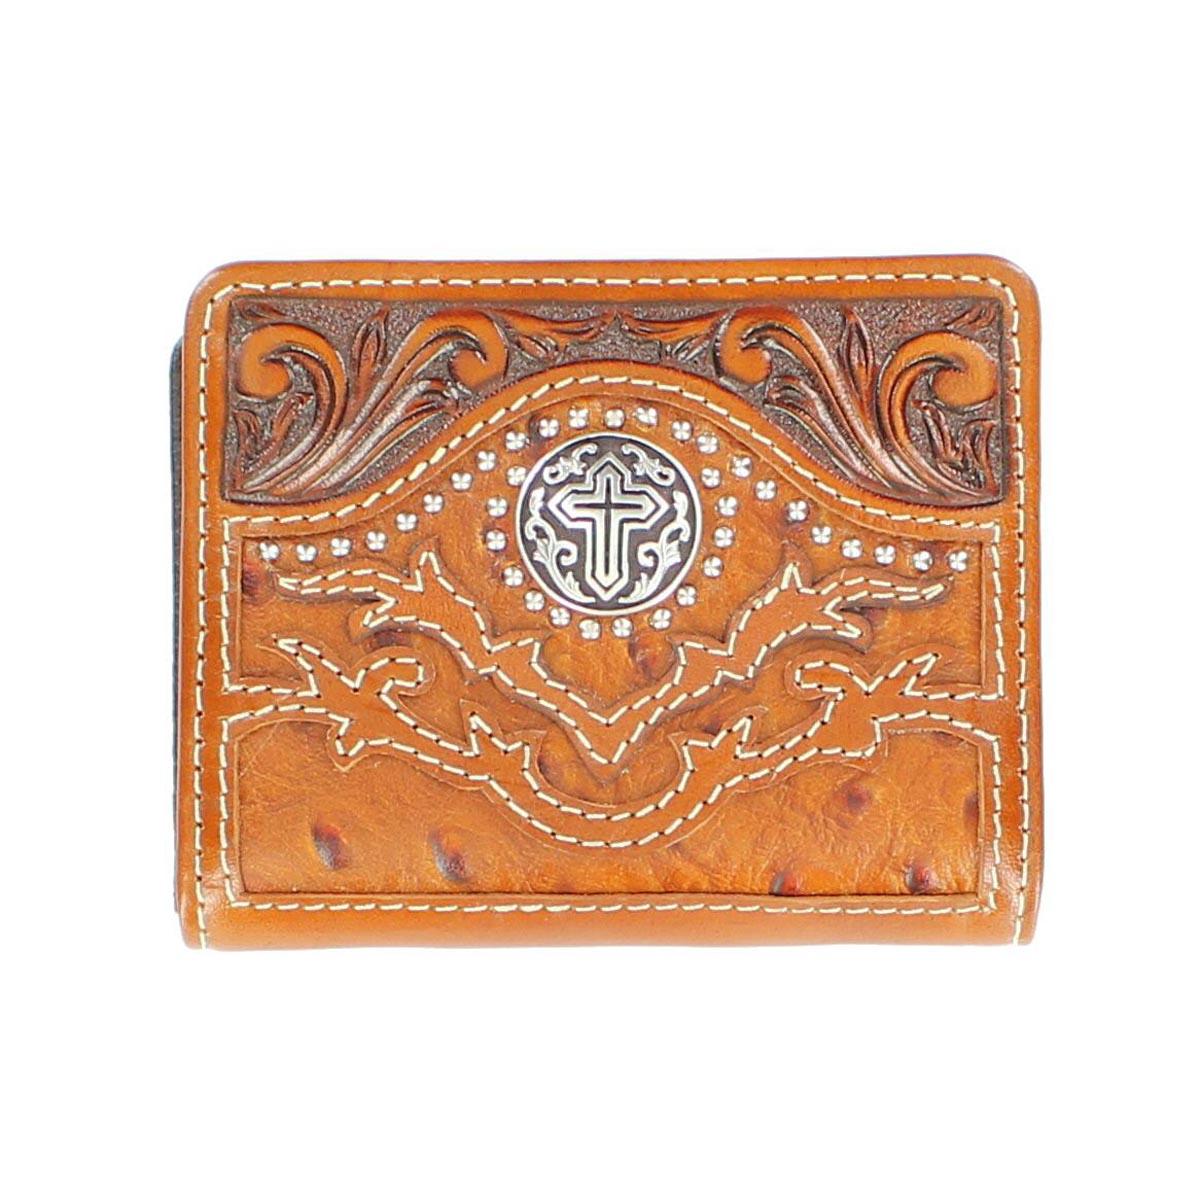 Nocona Bi-fold Ostrich Cross Concho Wallet